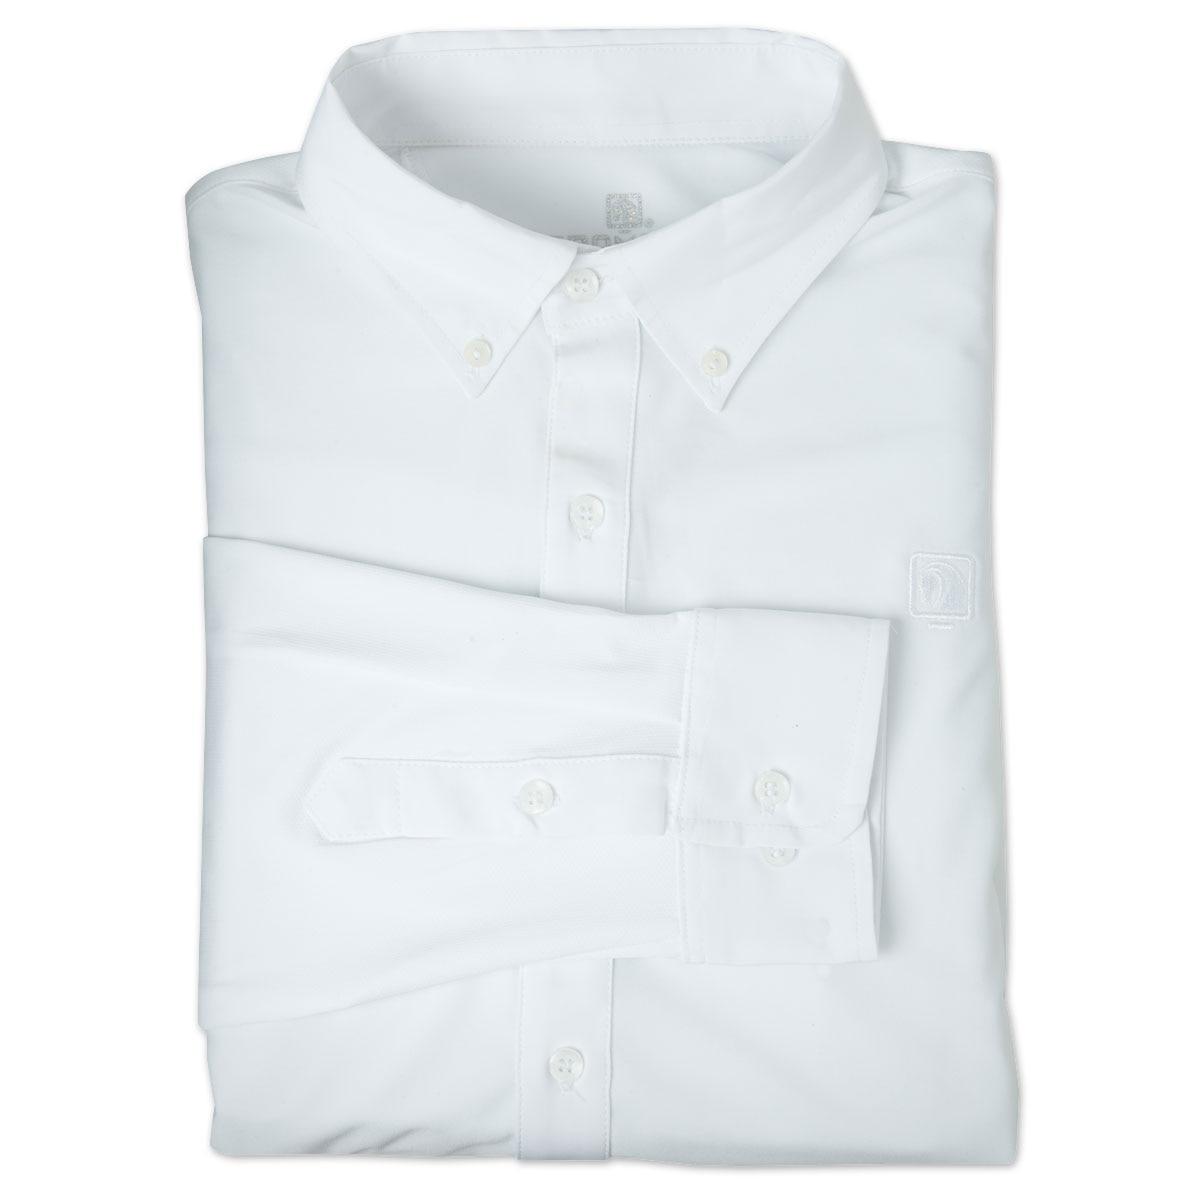 Romfh Boys Long Sleeve Competition Shirt